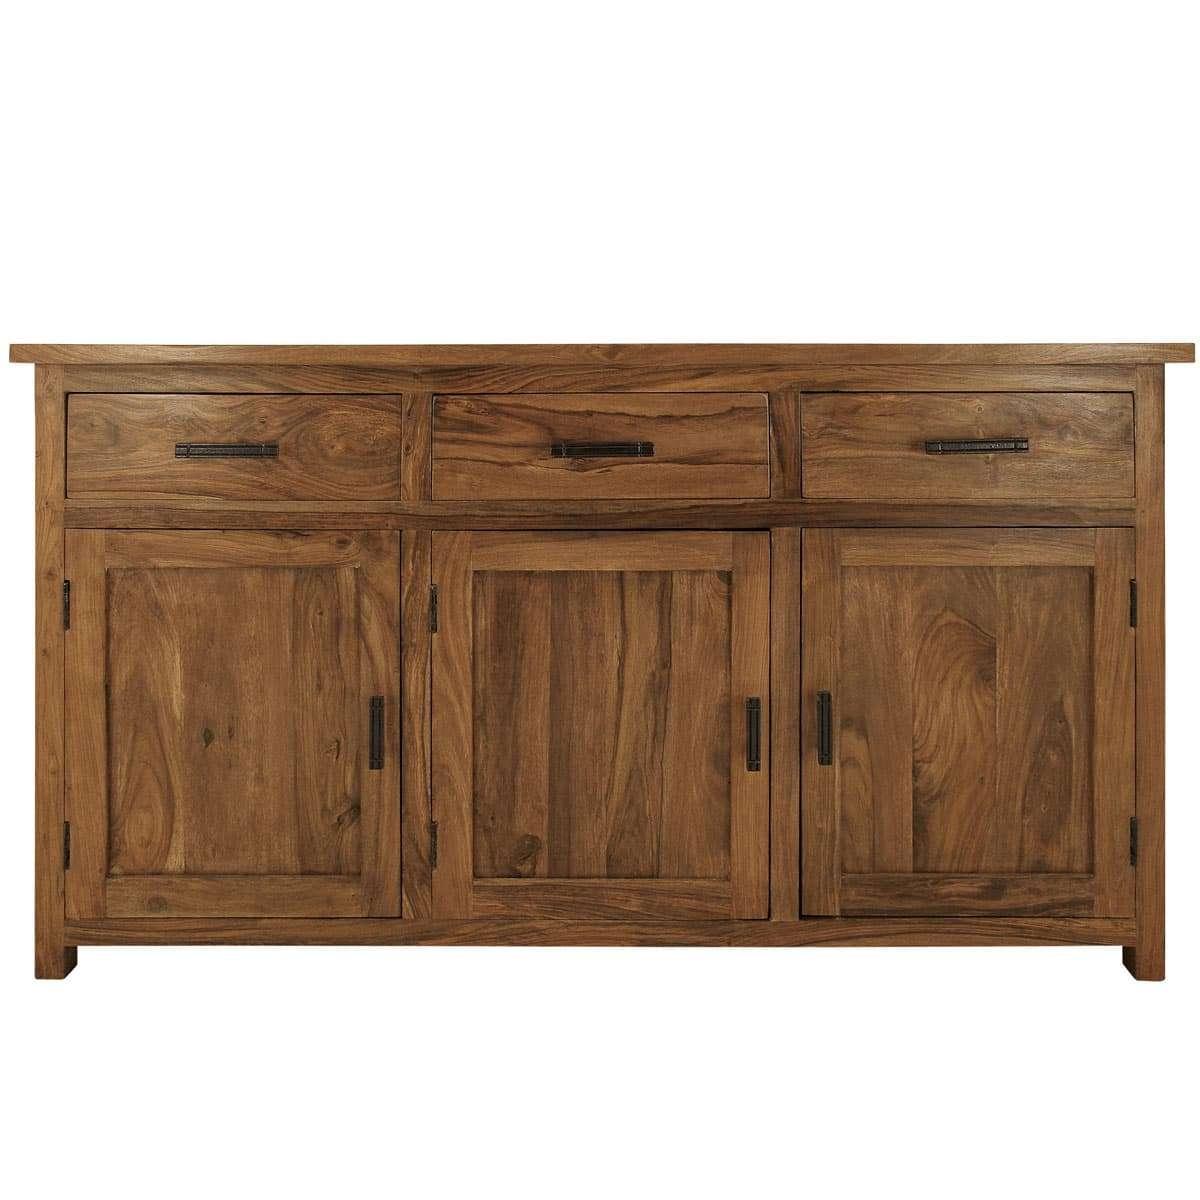 Indian Solid Dark Wood Sideboards Uk | Myakka.co (View 11 of 20)